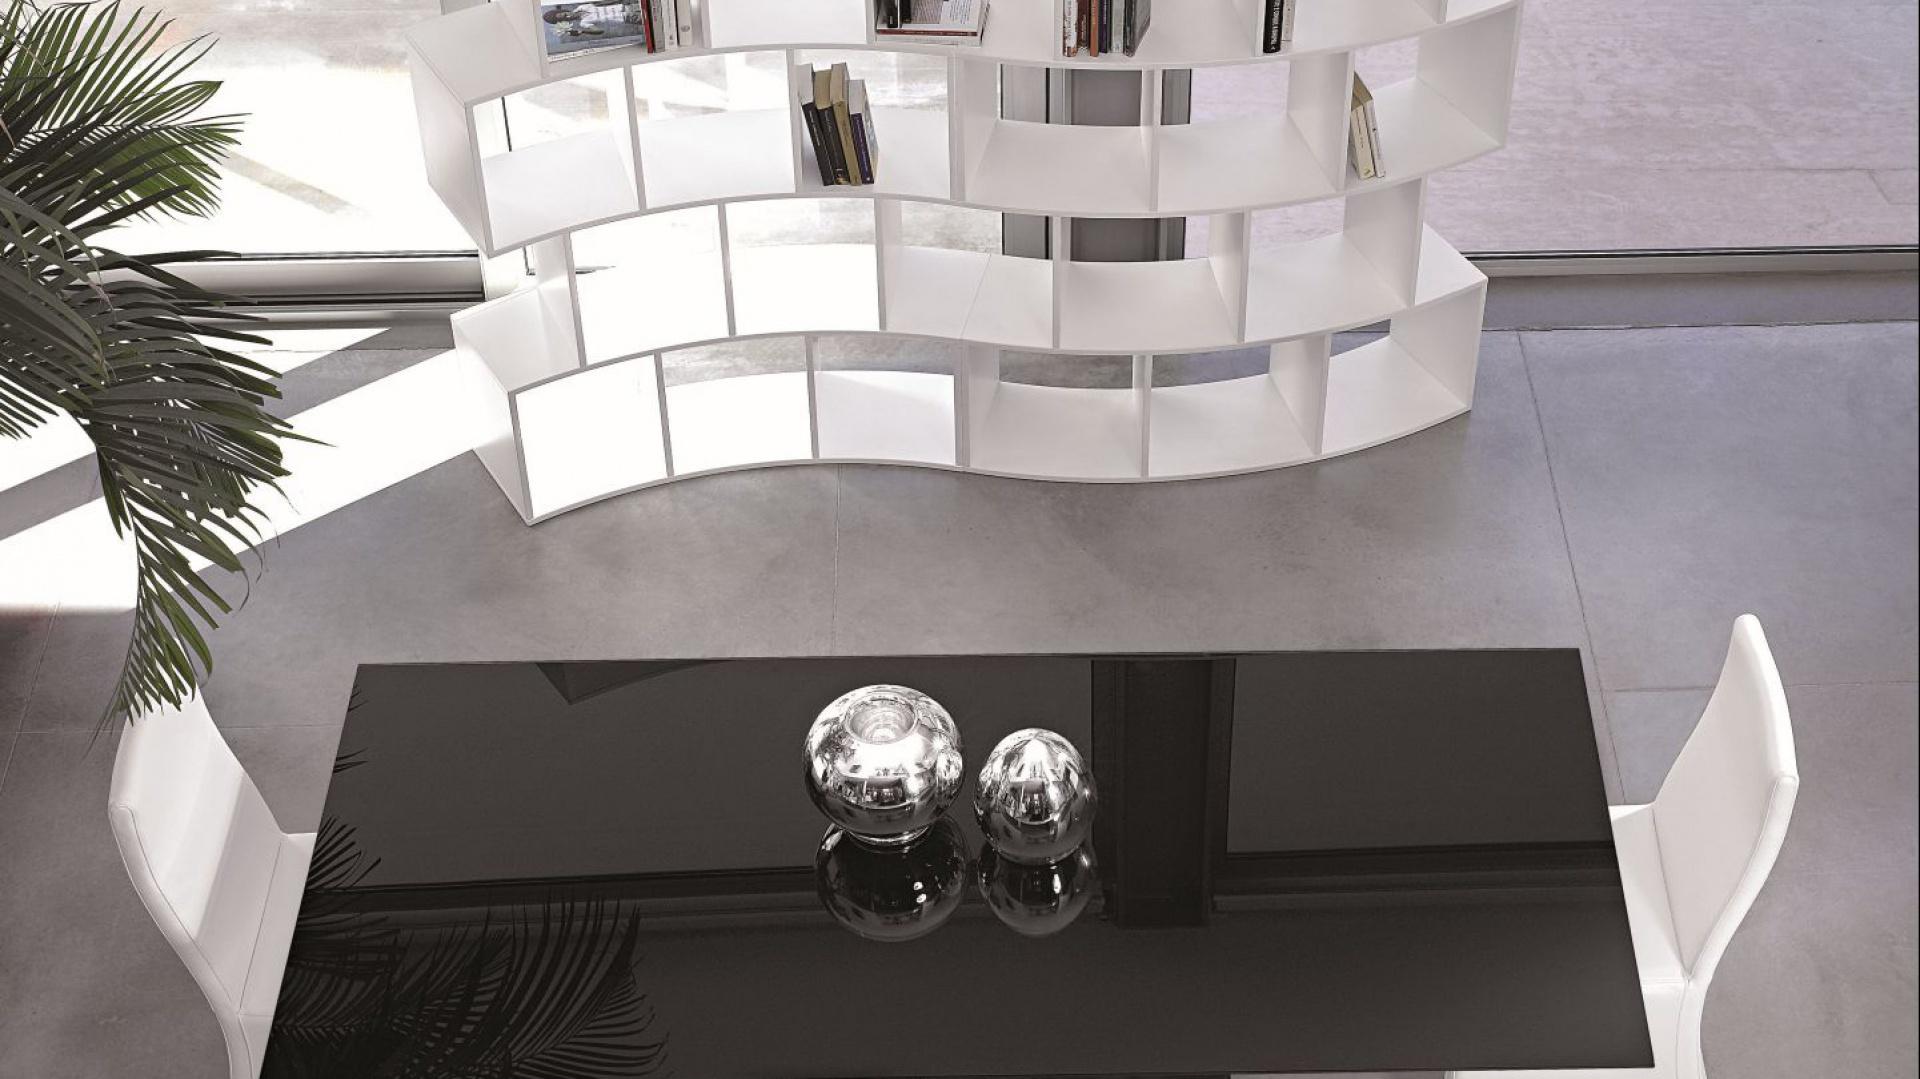 Czarno-biała kolekcja mebli marki Antonello. Fot. Ebano Design.